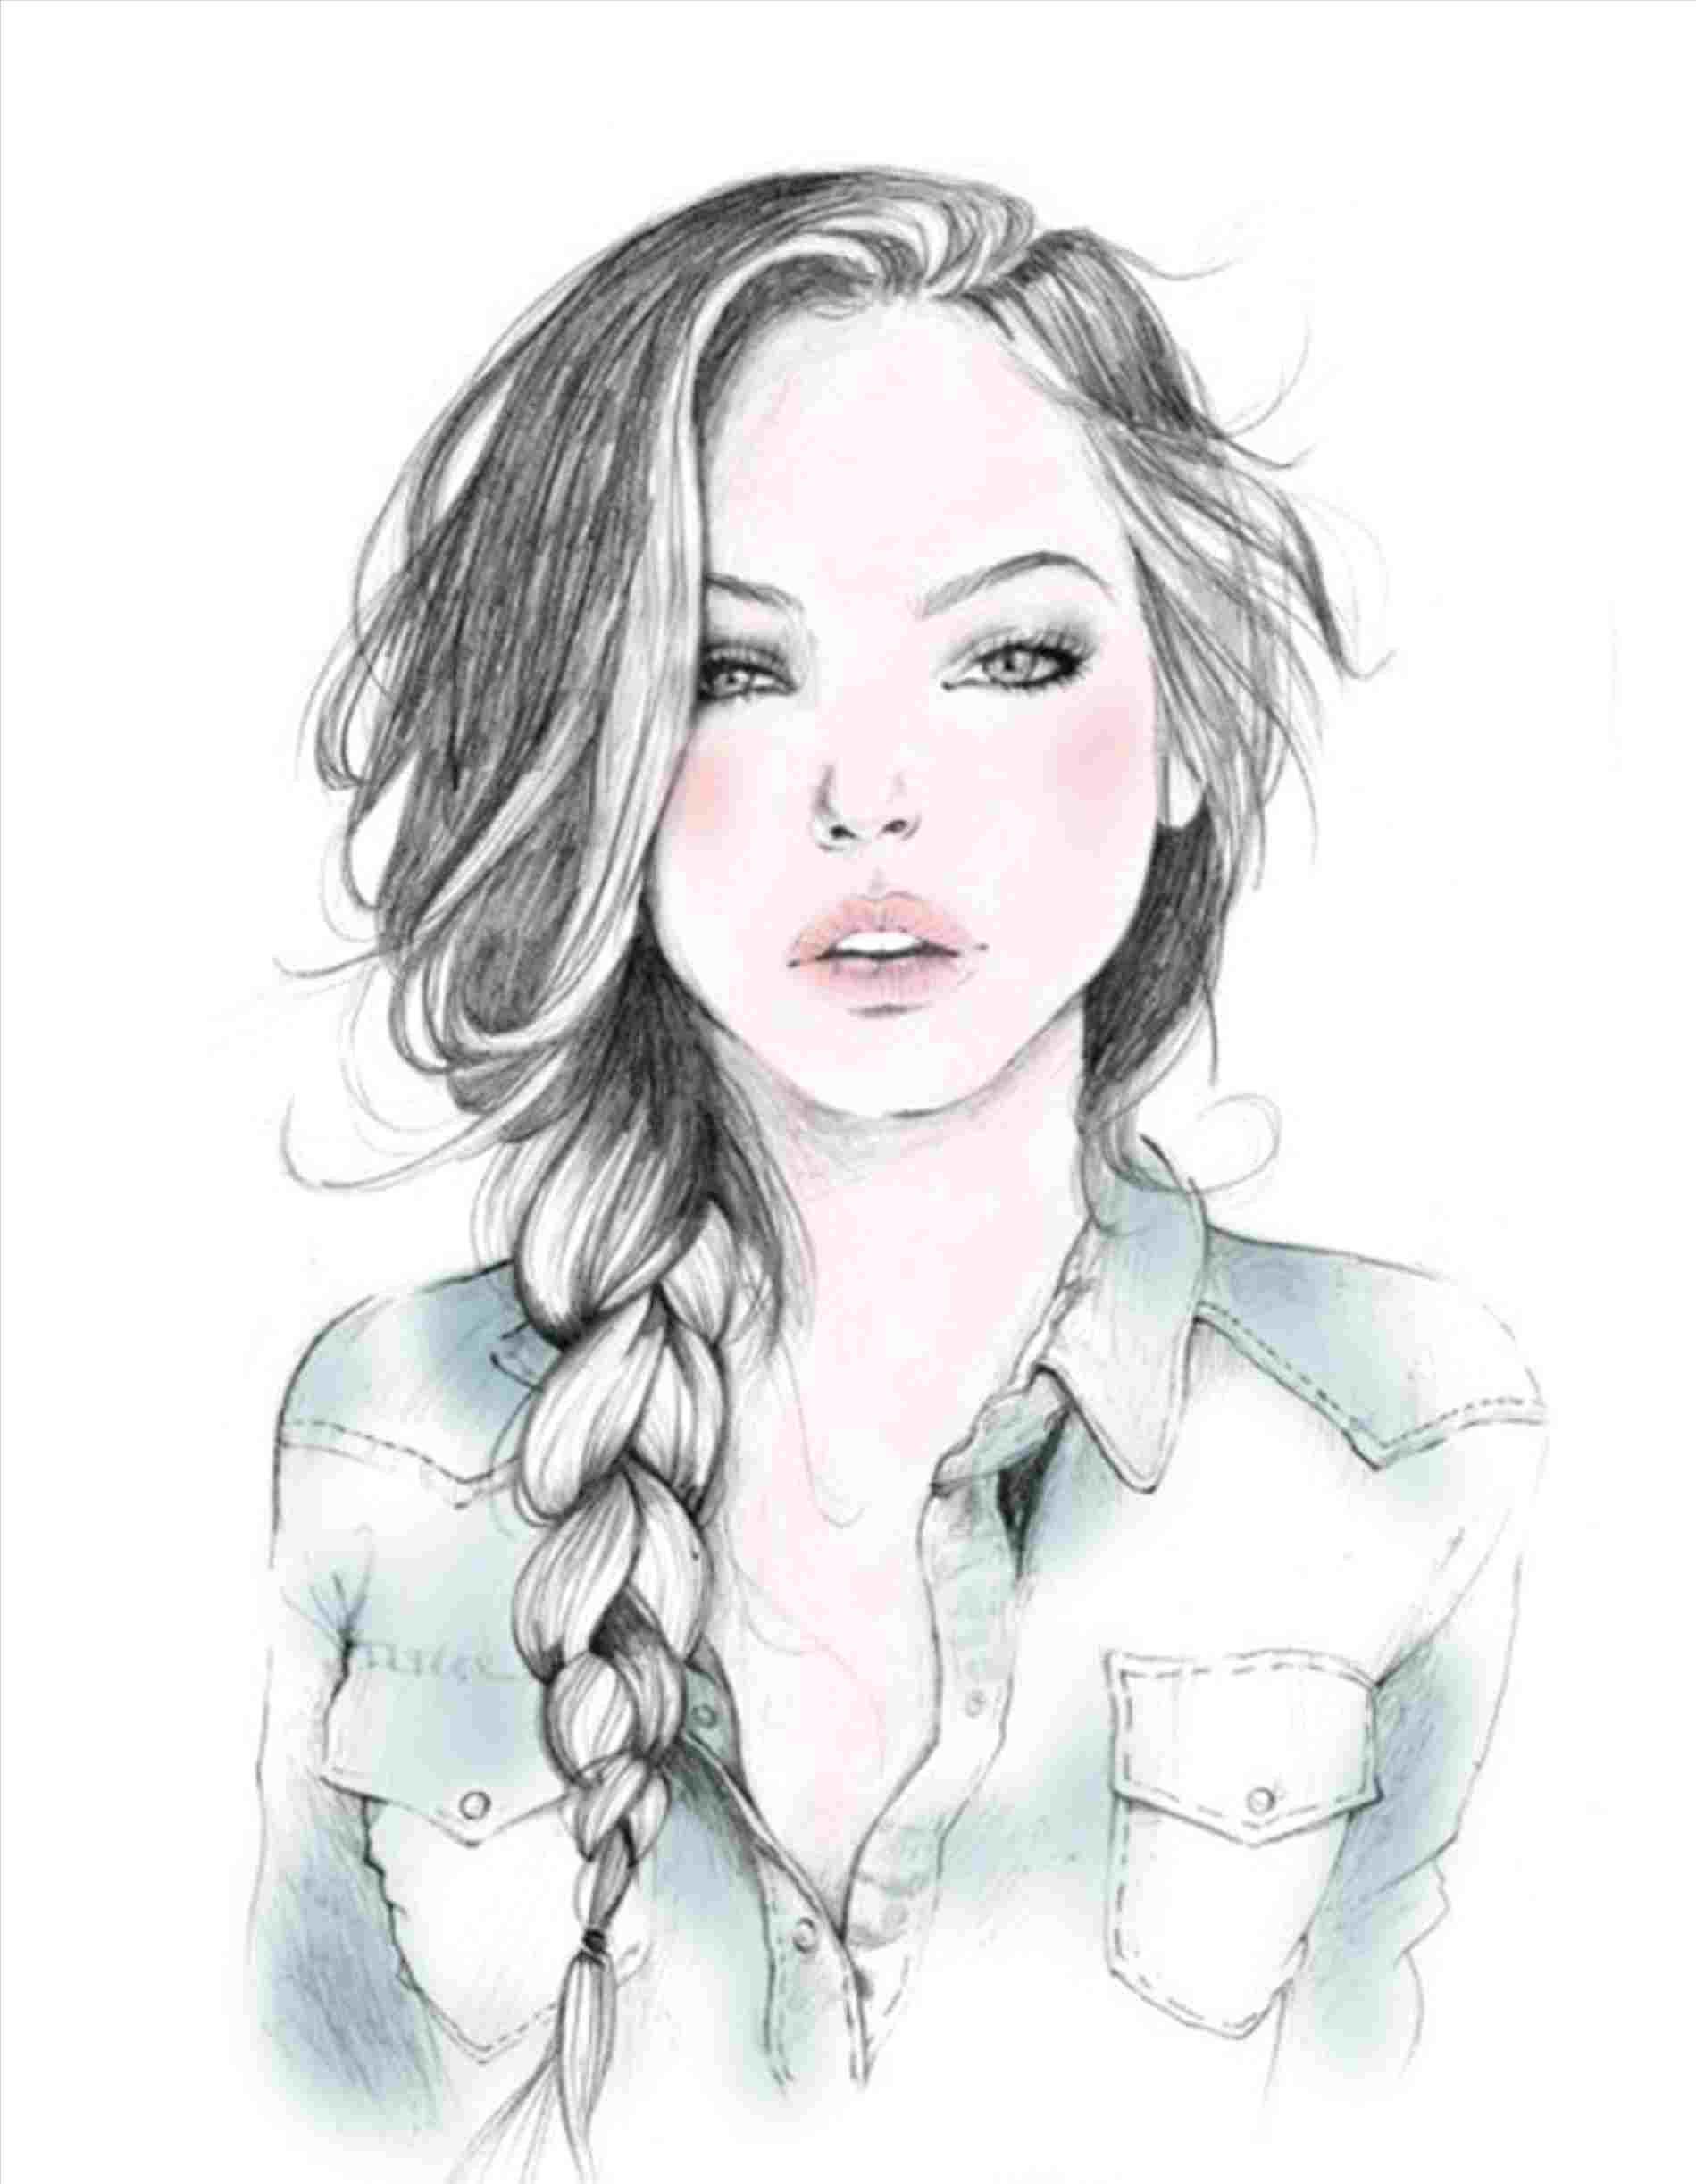 pinterest art artworkrhpinterestcom pin cute drawing of girls picuter od zuzia na s w pinterest art i artworkrhpinterestcom how to draw a teenage girl easy wapousrhwapous jpg